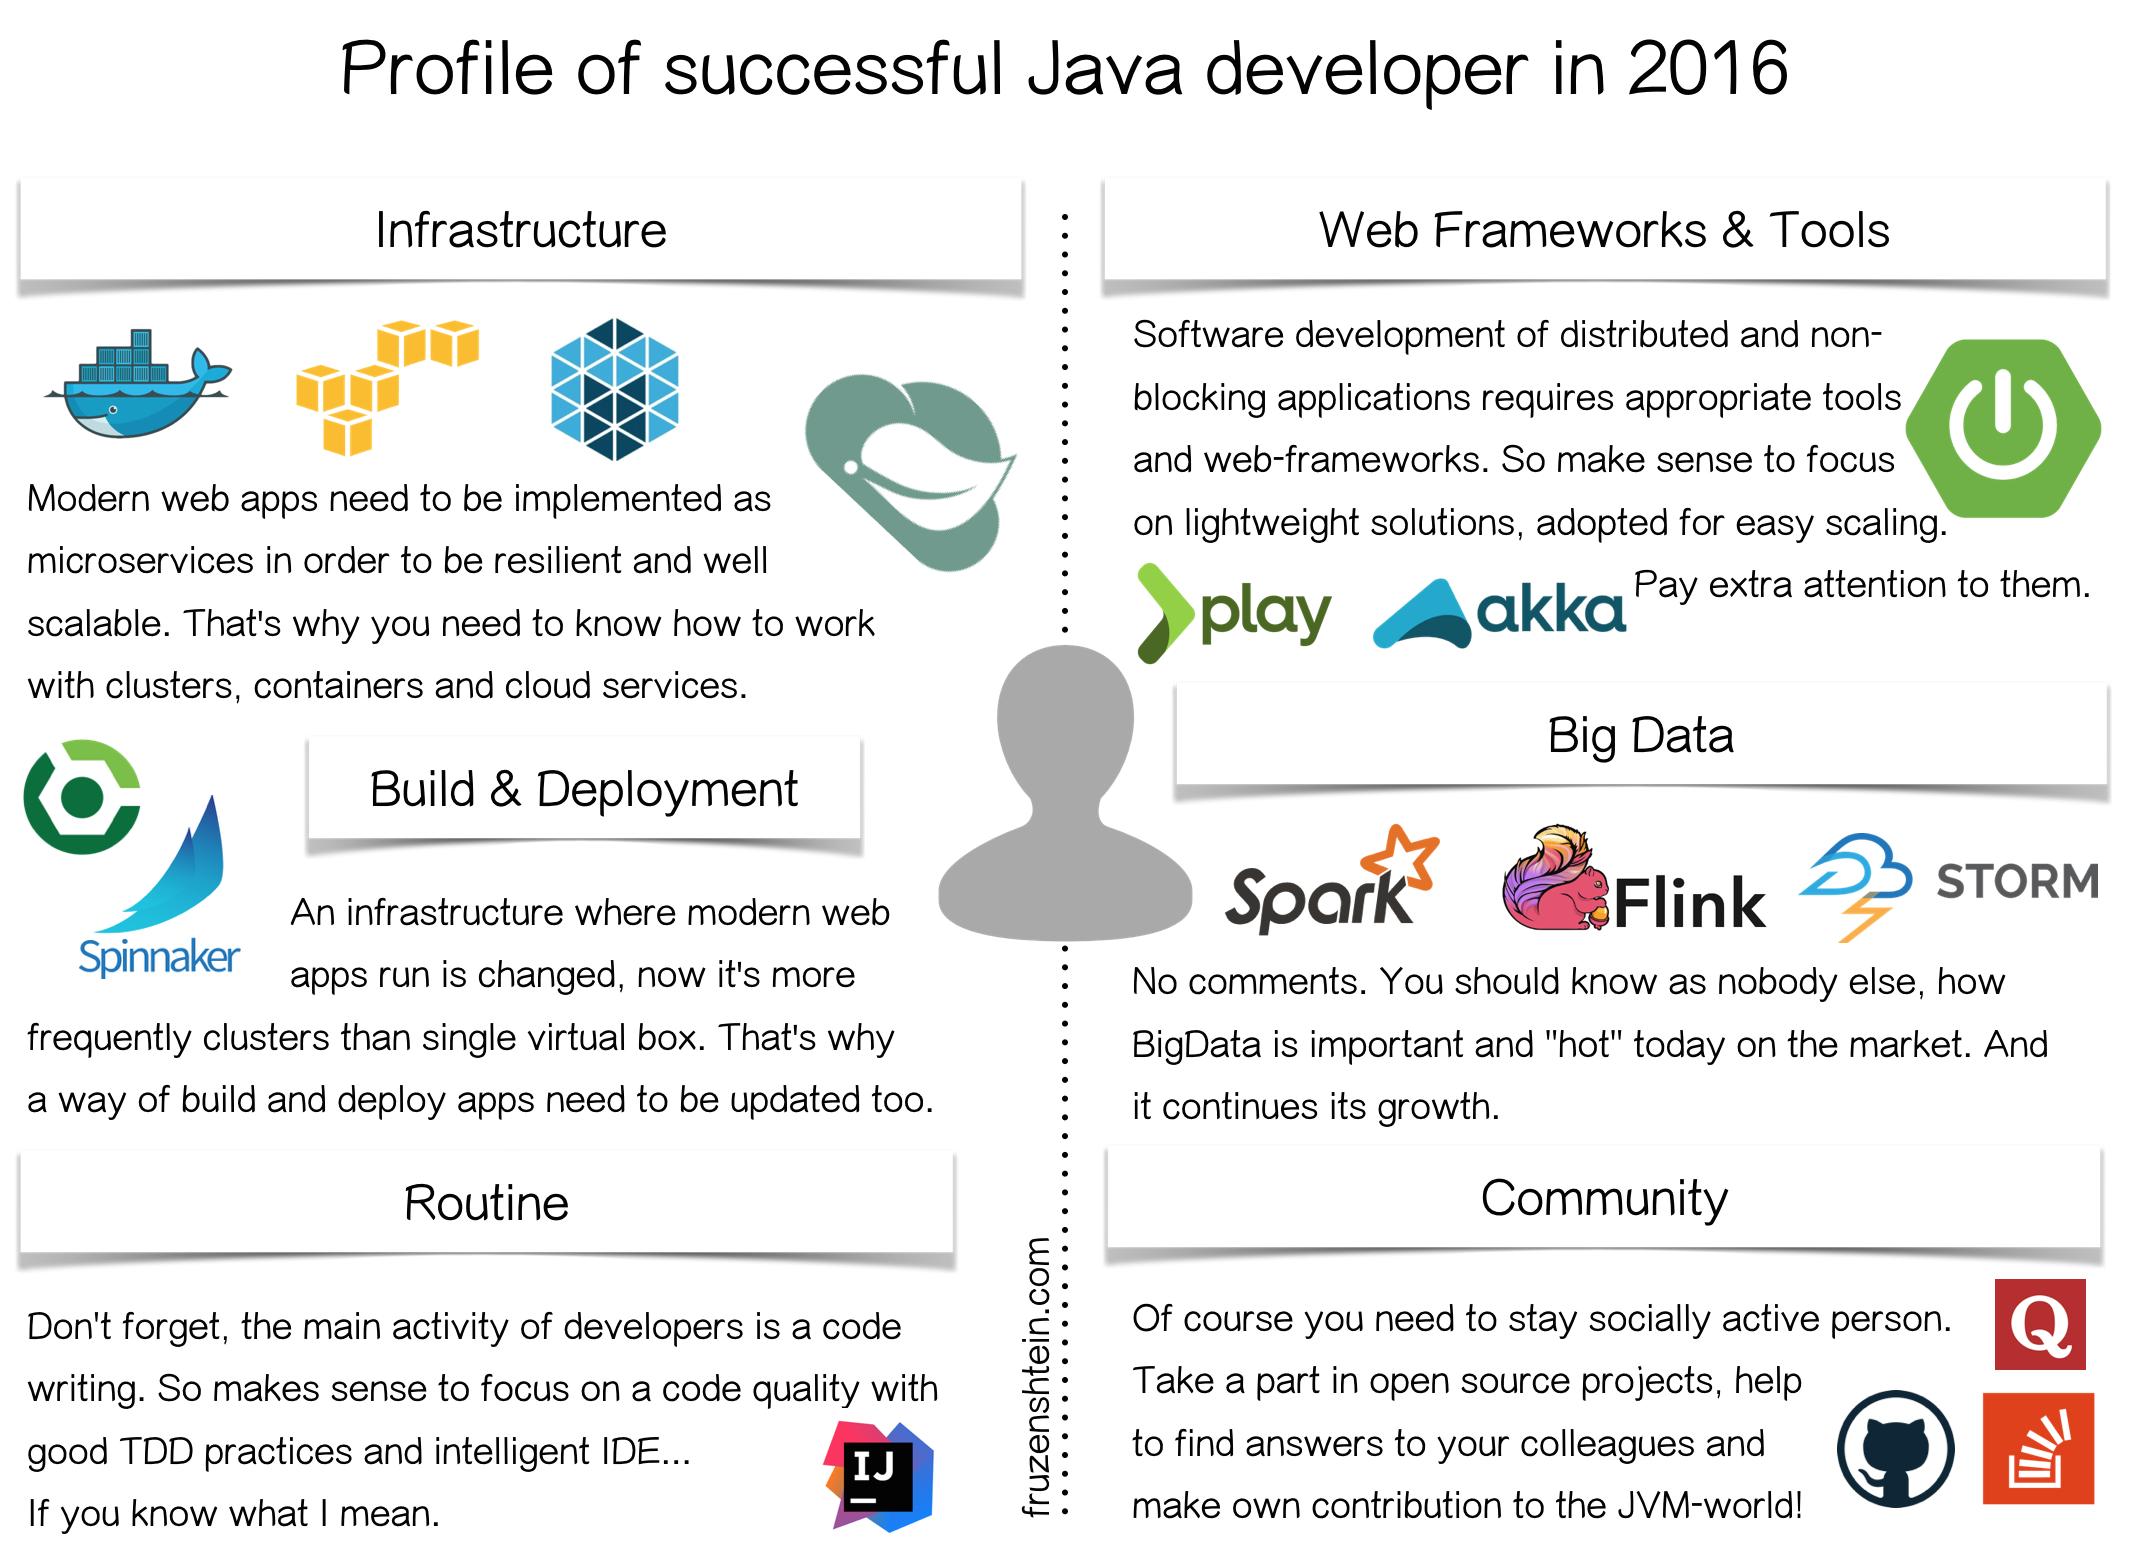 Profile of successful Java developer in 2016